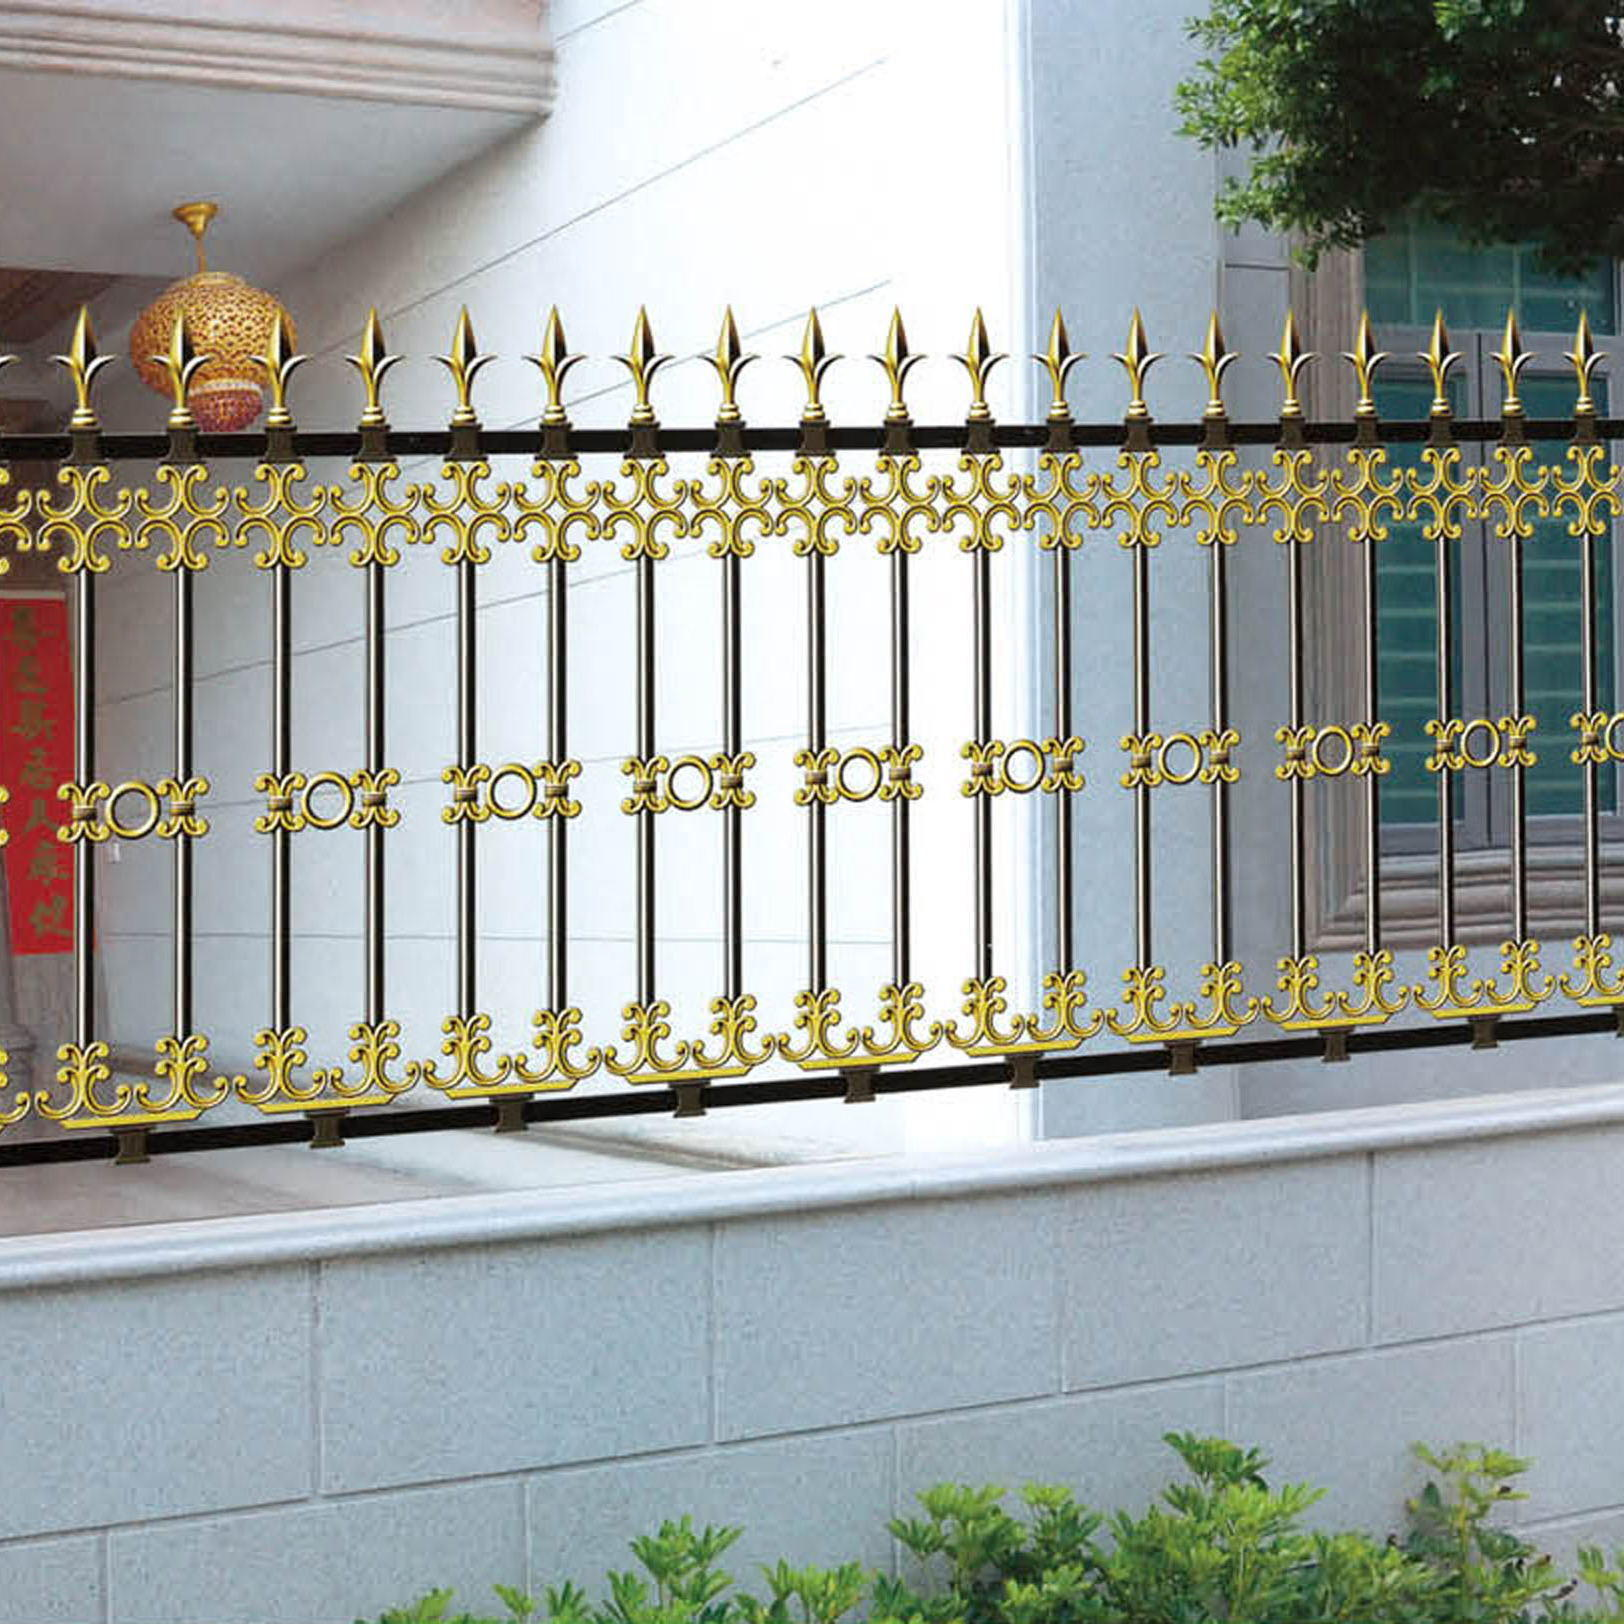 Customized Aluminum Garden Fence For Courtyard